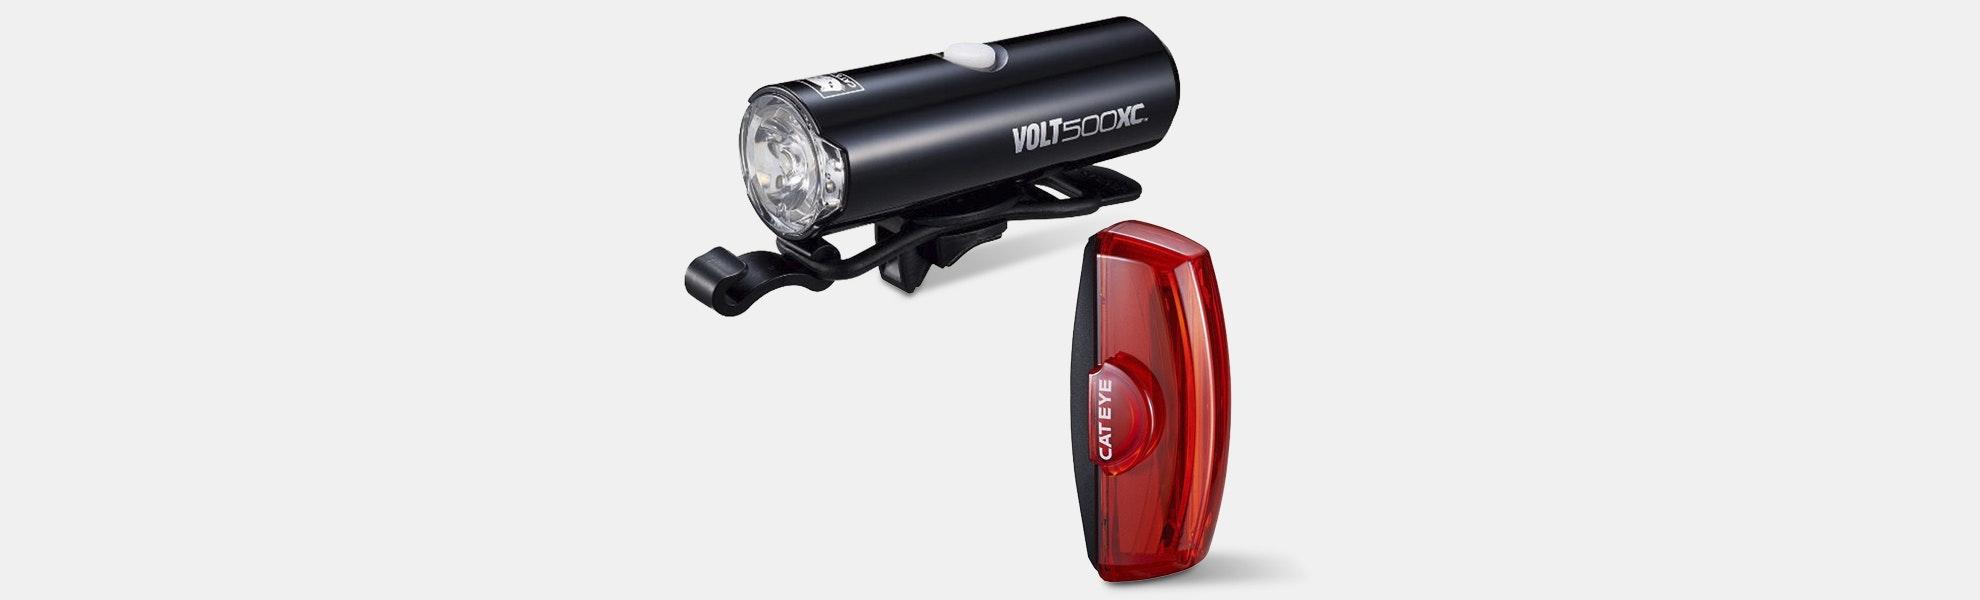 CatEye Volt500 XC & Rapid X2 Light Combo Kit